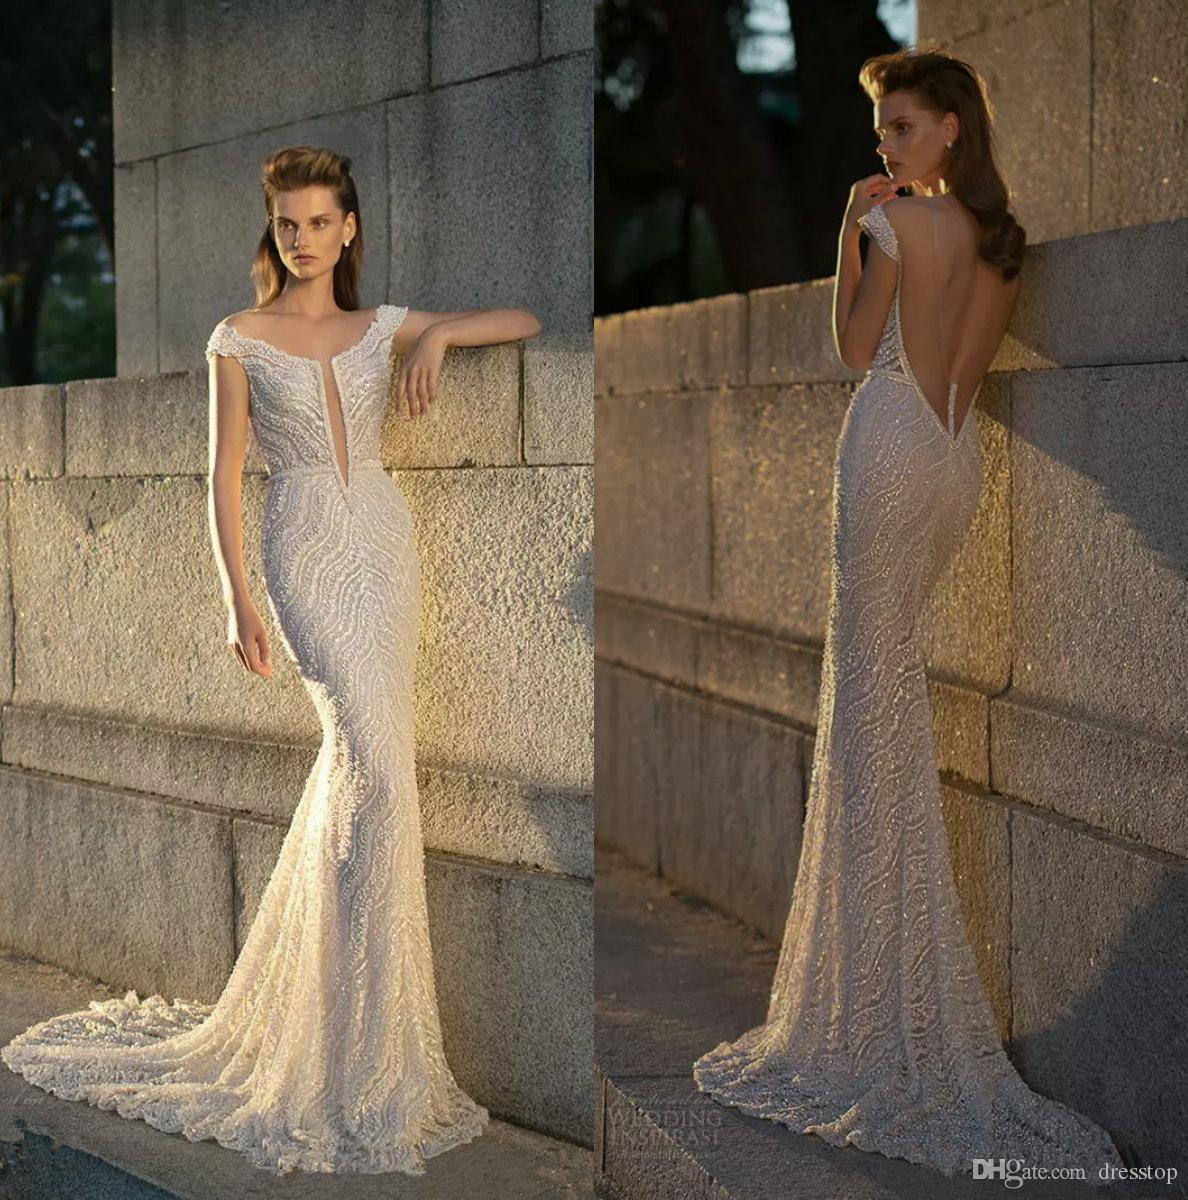 7aaa0aec0bd71 2018 Sexy Berta Beading Mermaid Wedding Dress Sweep Train Sleeveless  Backless Trumpet Bridal Gowns Custom Made